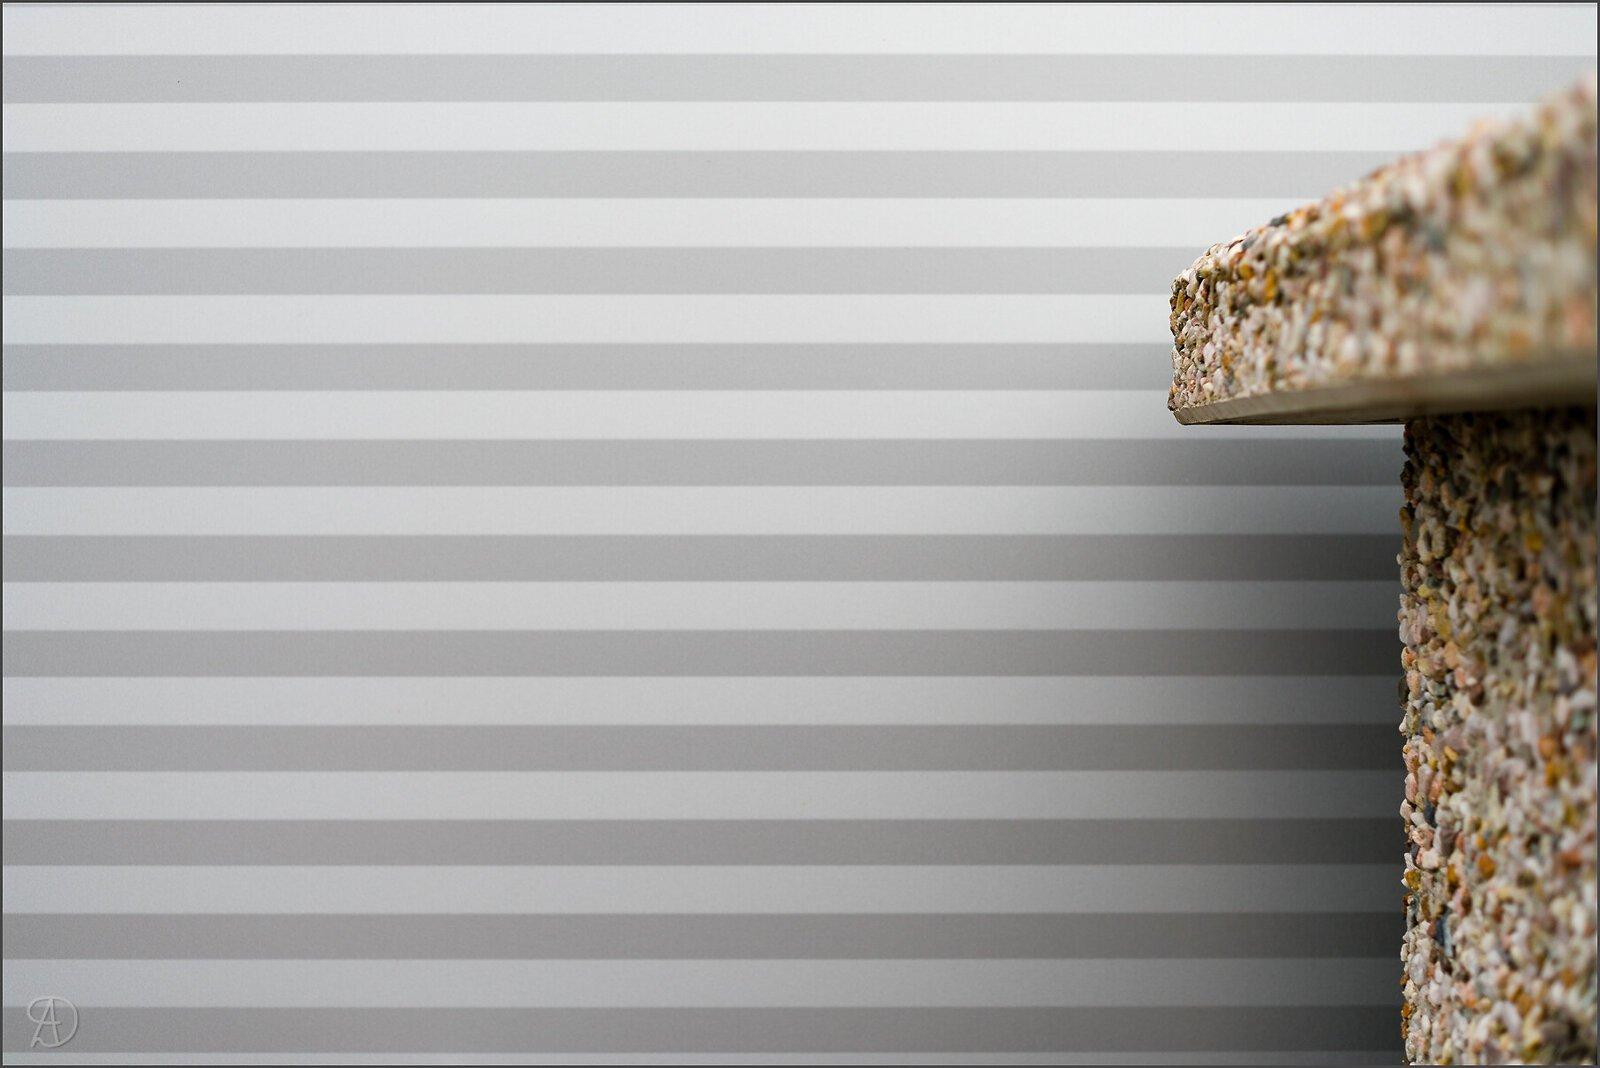 S03-20210104-034.jpg